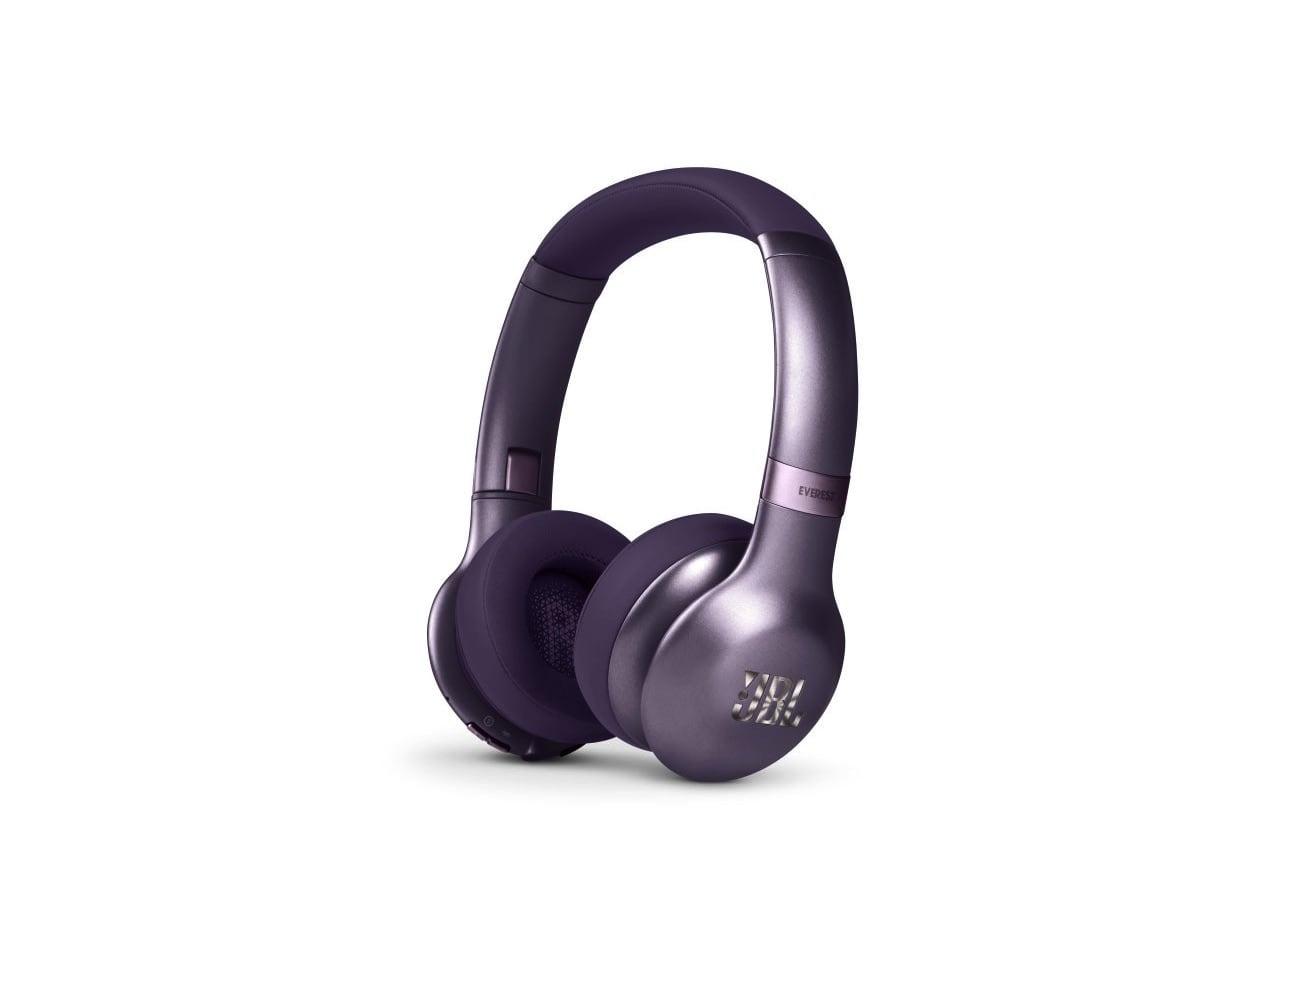 JBL Everest Google Assistant Headphones